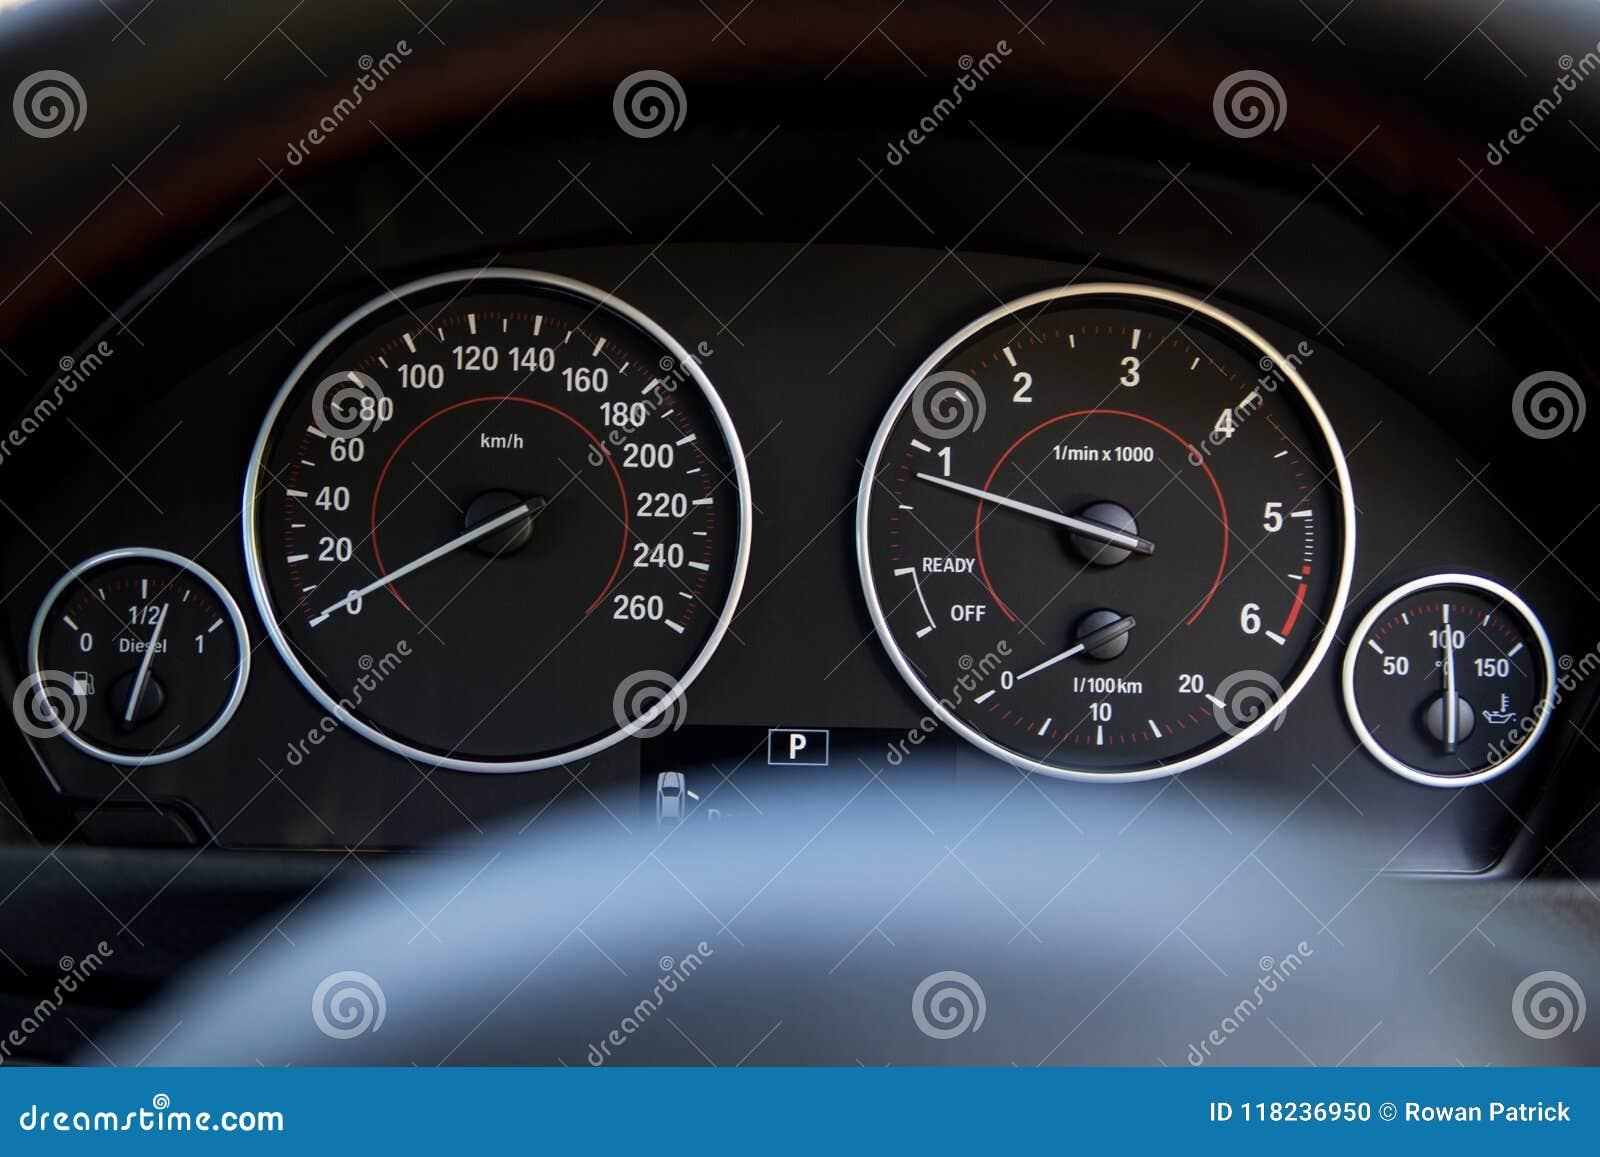 Bmw Car Speedometer Dials Black Editorial Image Image Of Details